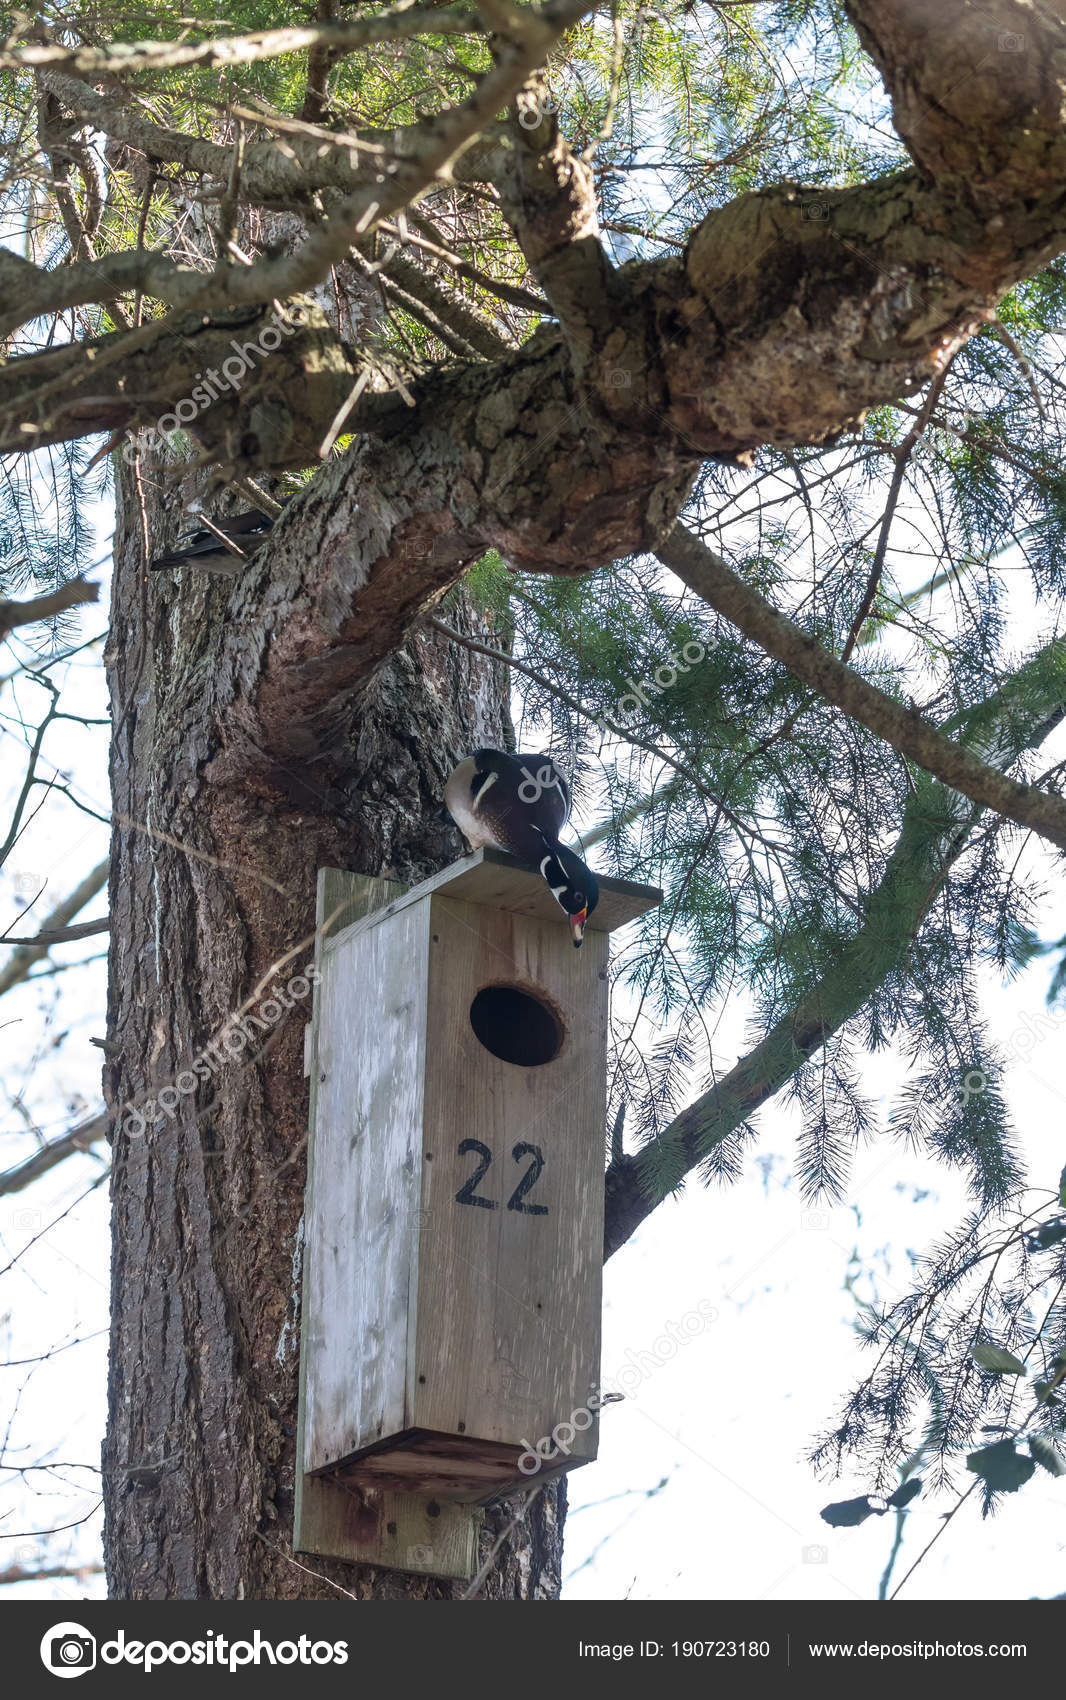 Wood duck nest box canada stock photo devon 190723180 wood duck nest box canada stock photo publicscrutiny Choice Image